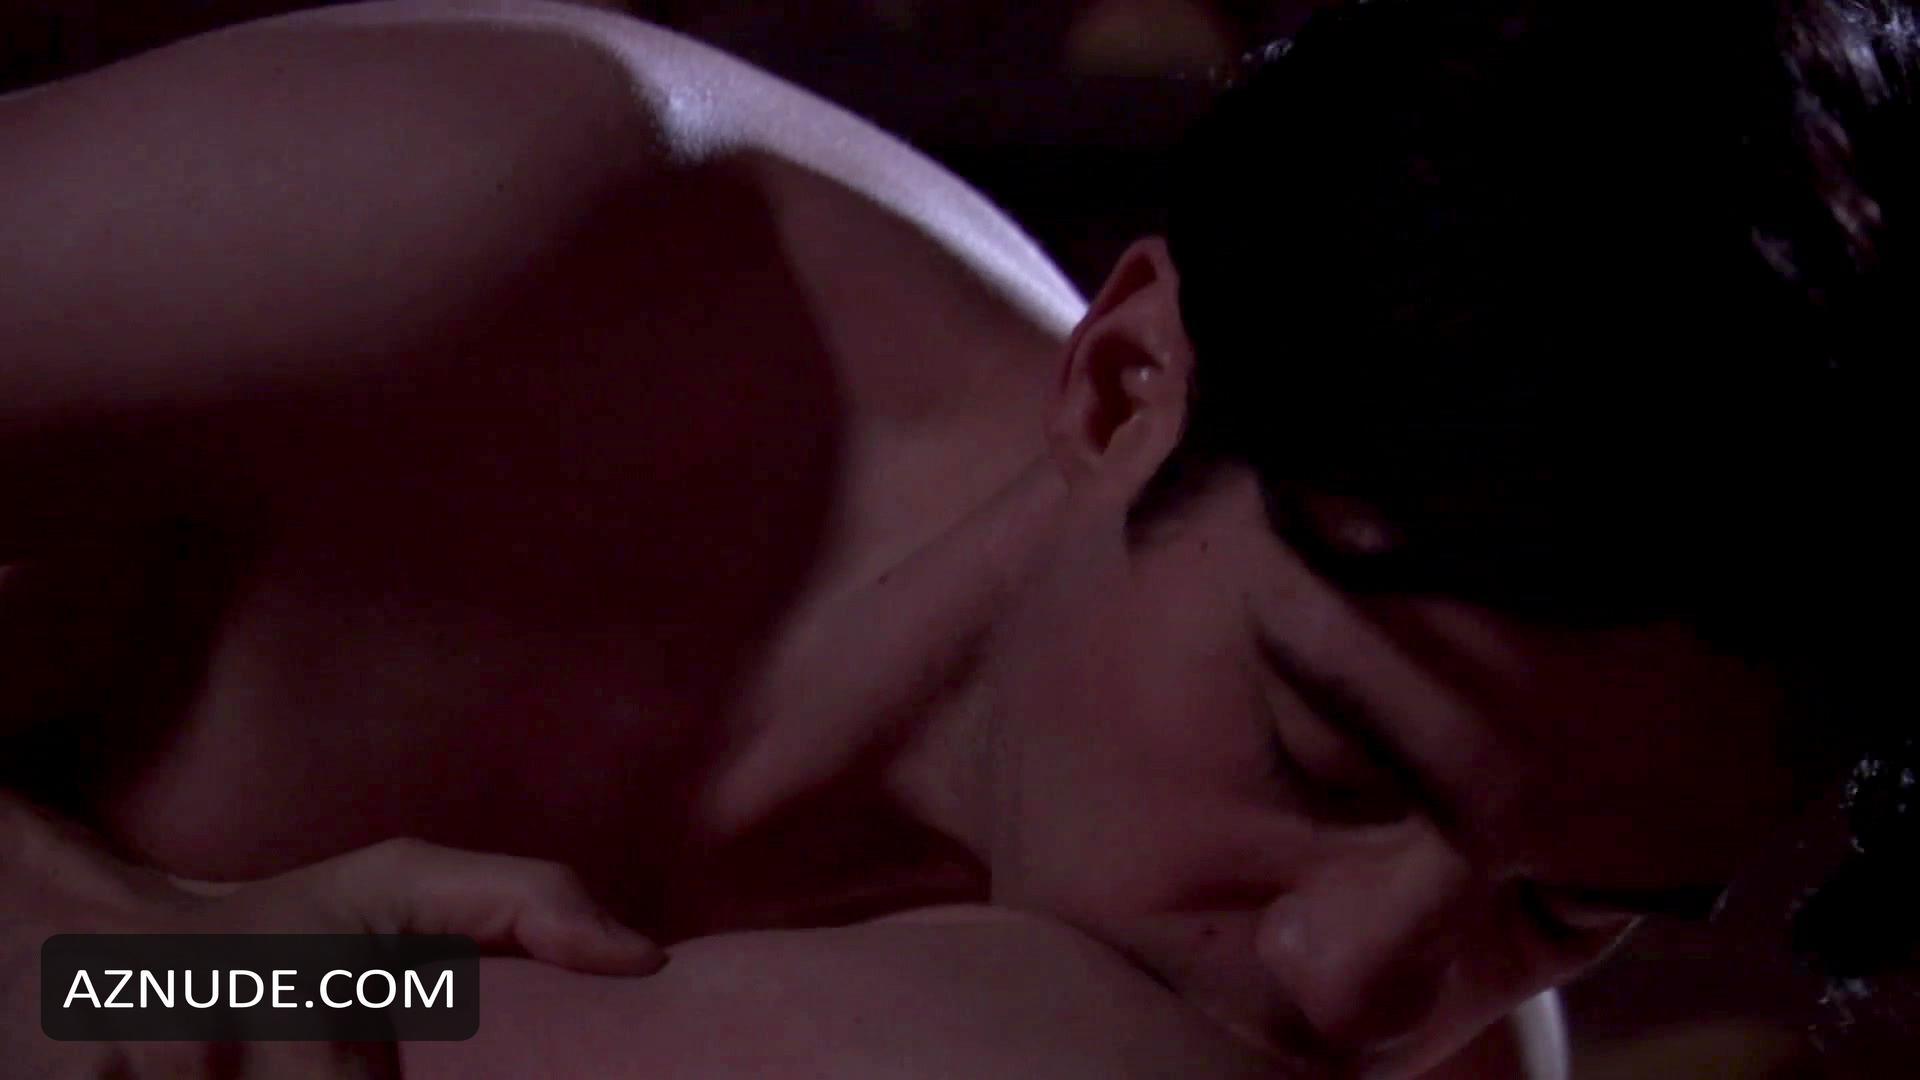 Twilight Star Robert Pattinson Talks About Nude Gay Sex Scenes In Little Ashes